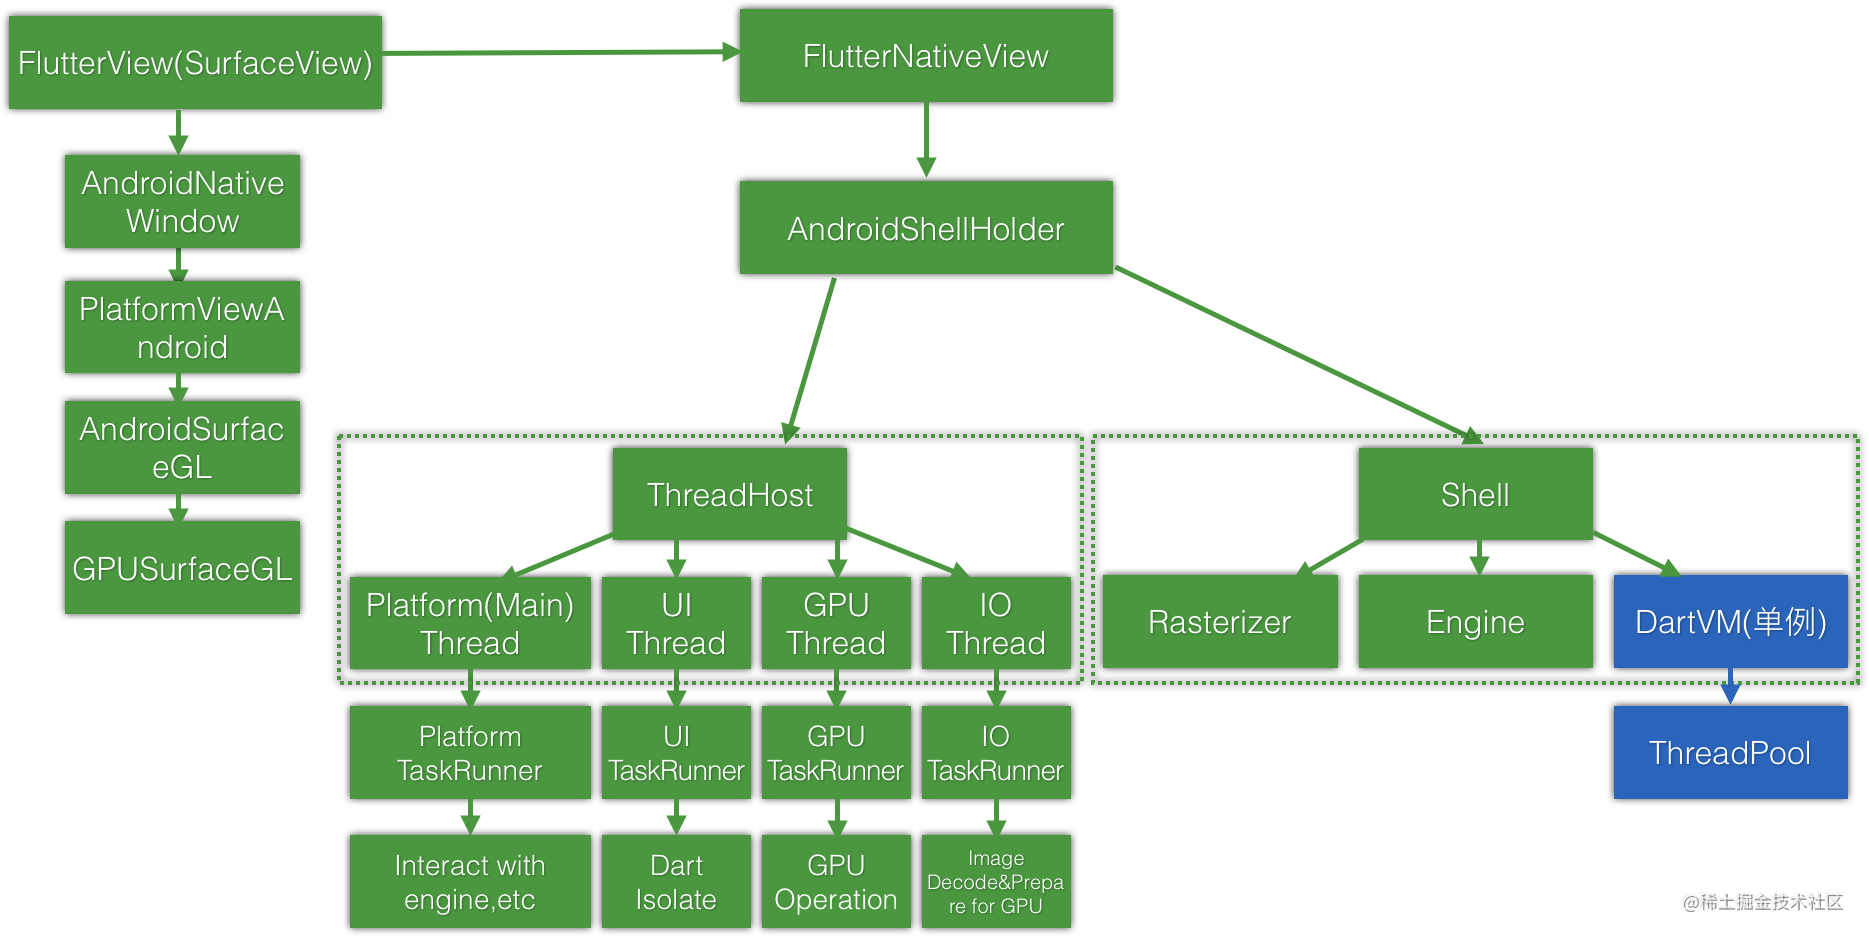 android-flutternativeview-logic-behind